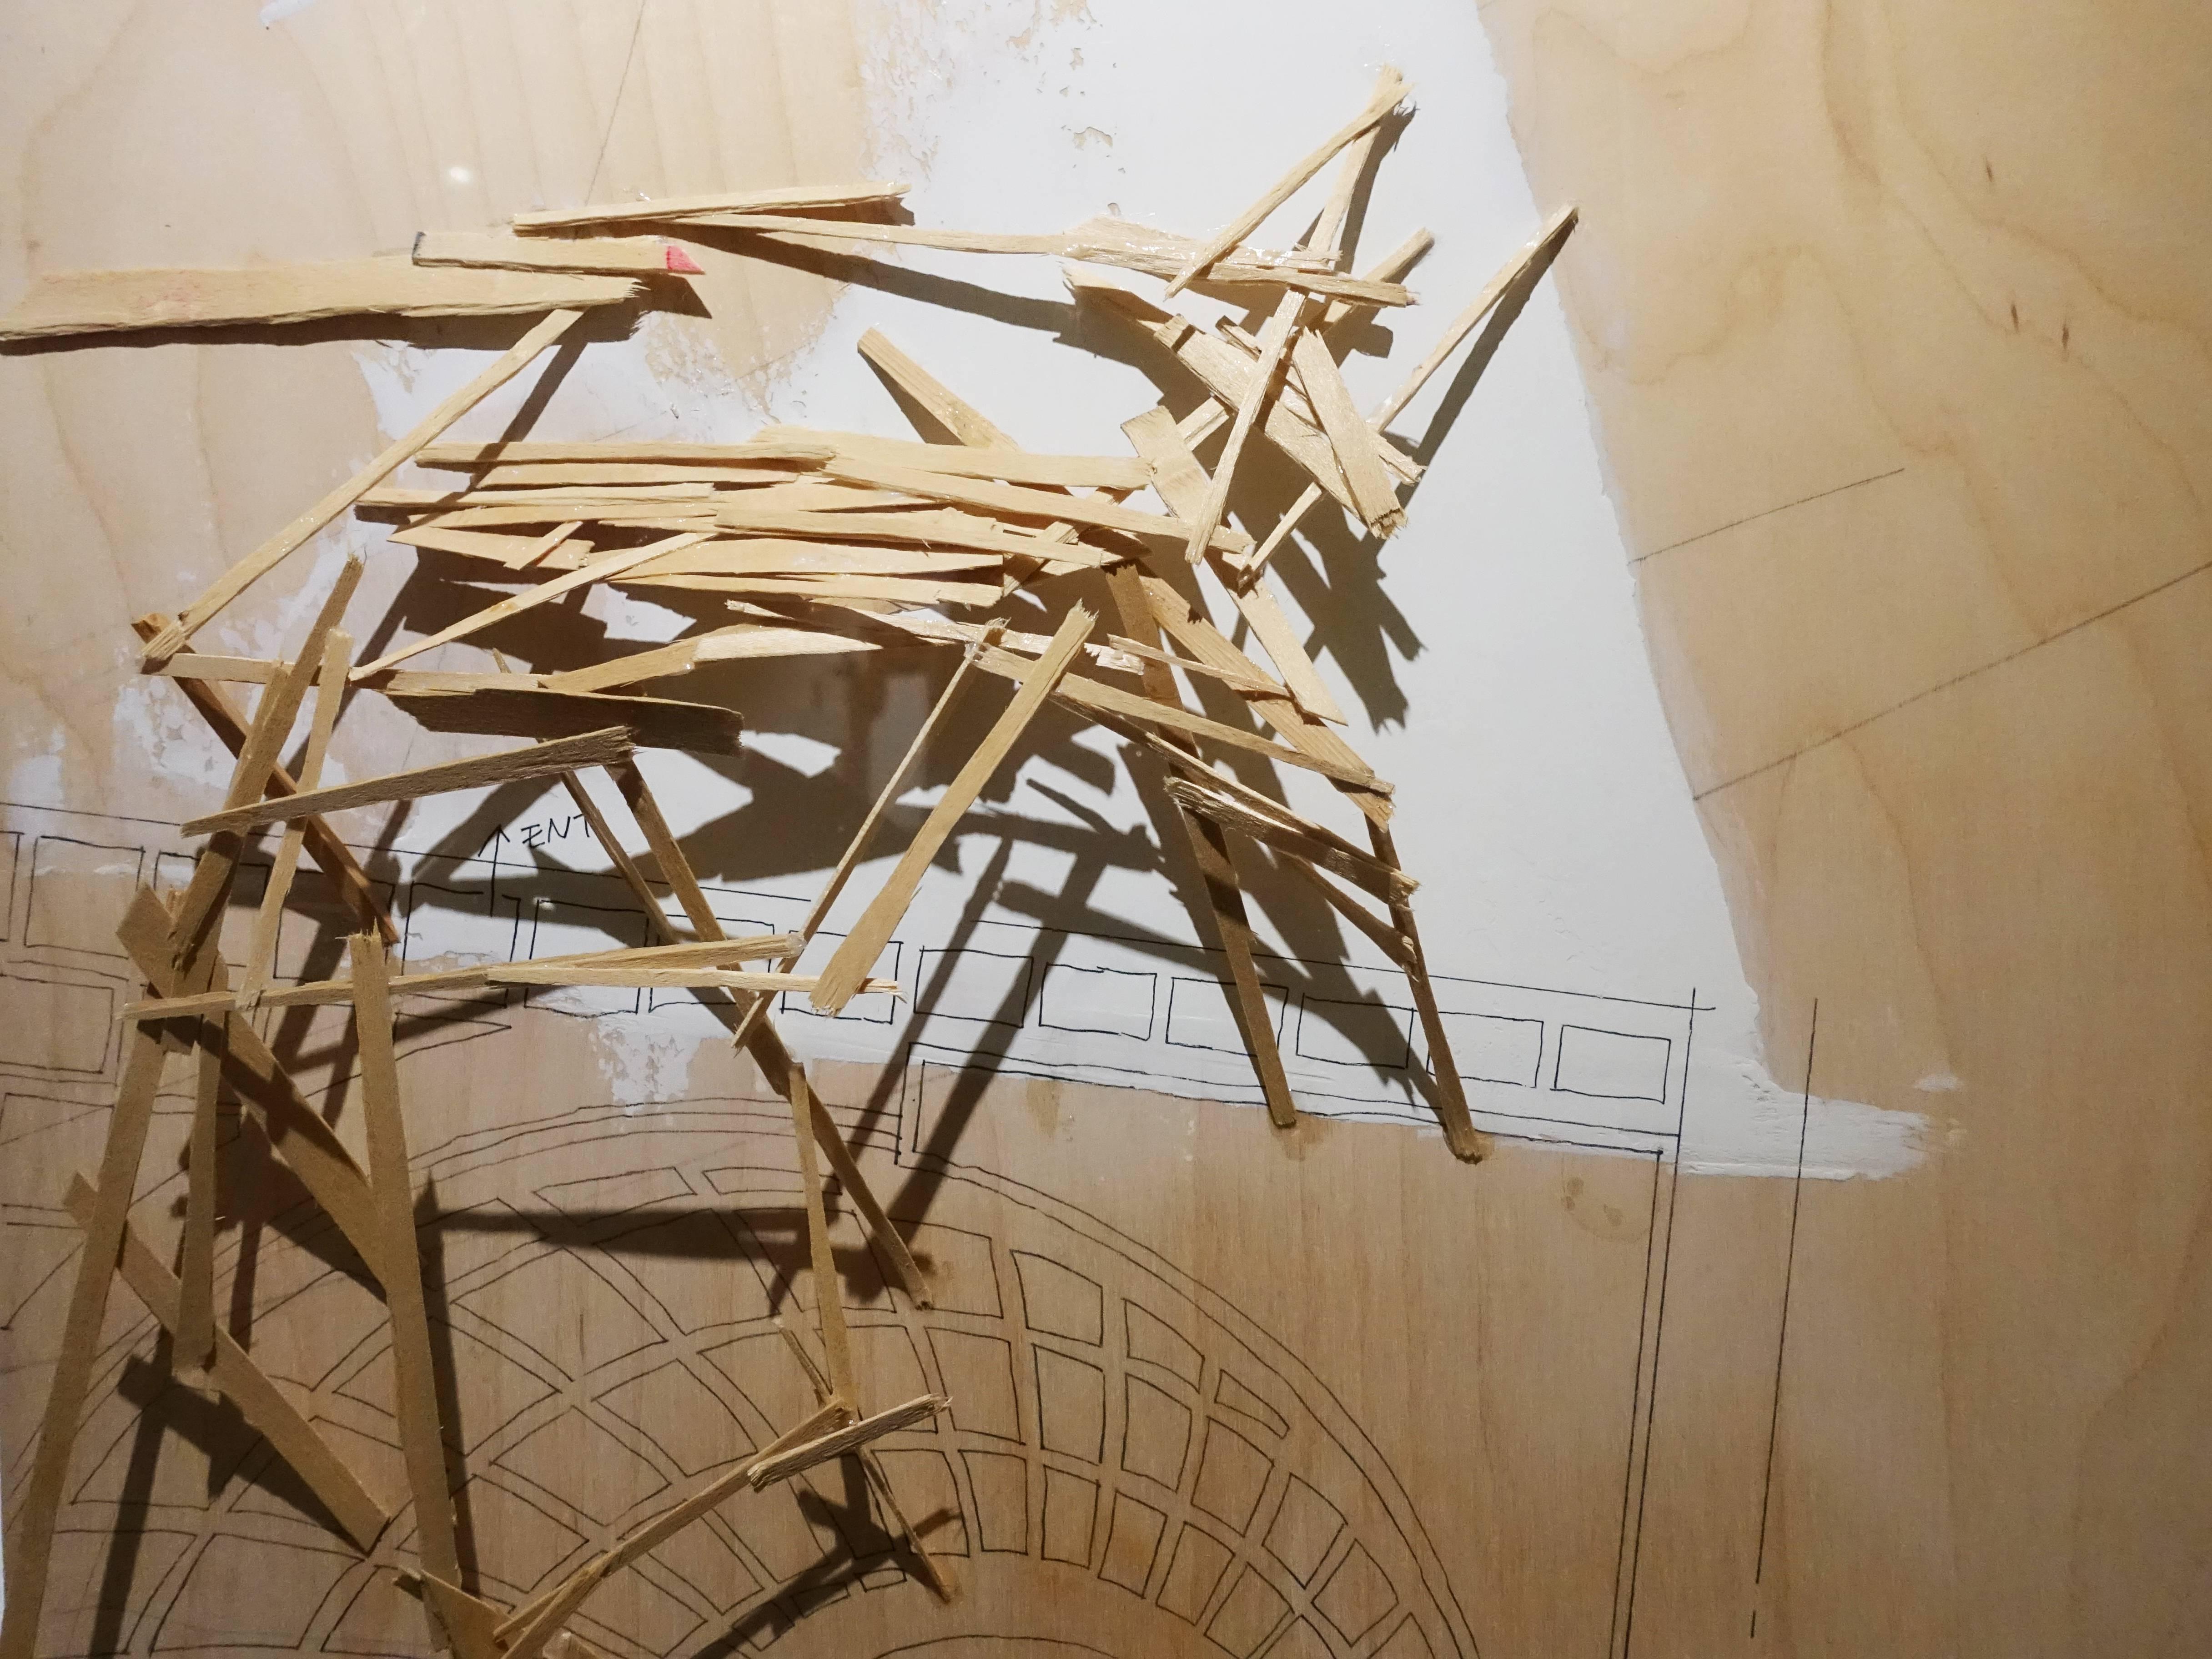 川俣正,《TILTED ARC PLAN(ARC-4)》細節,58.5 x 58.5 cm,木に彩色,1985。